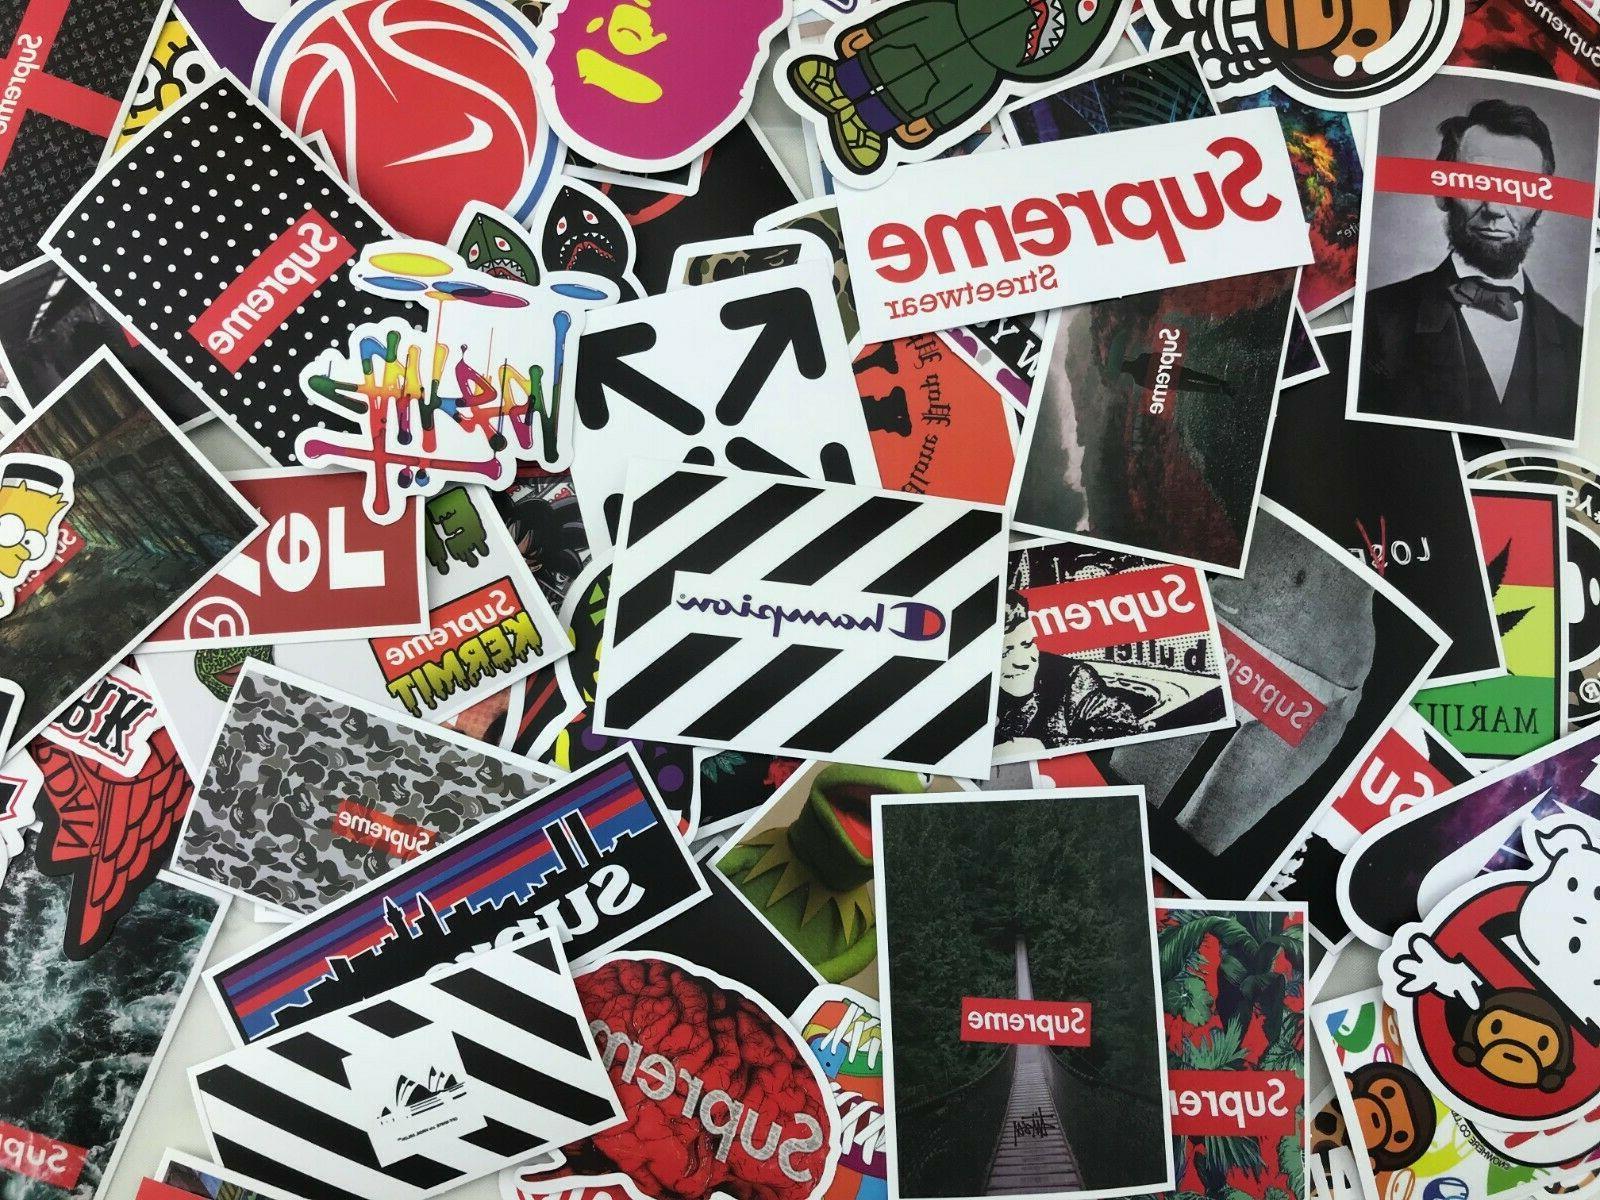 200 random stickers waterproof laptop luggage hyperbeast